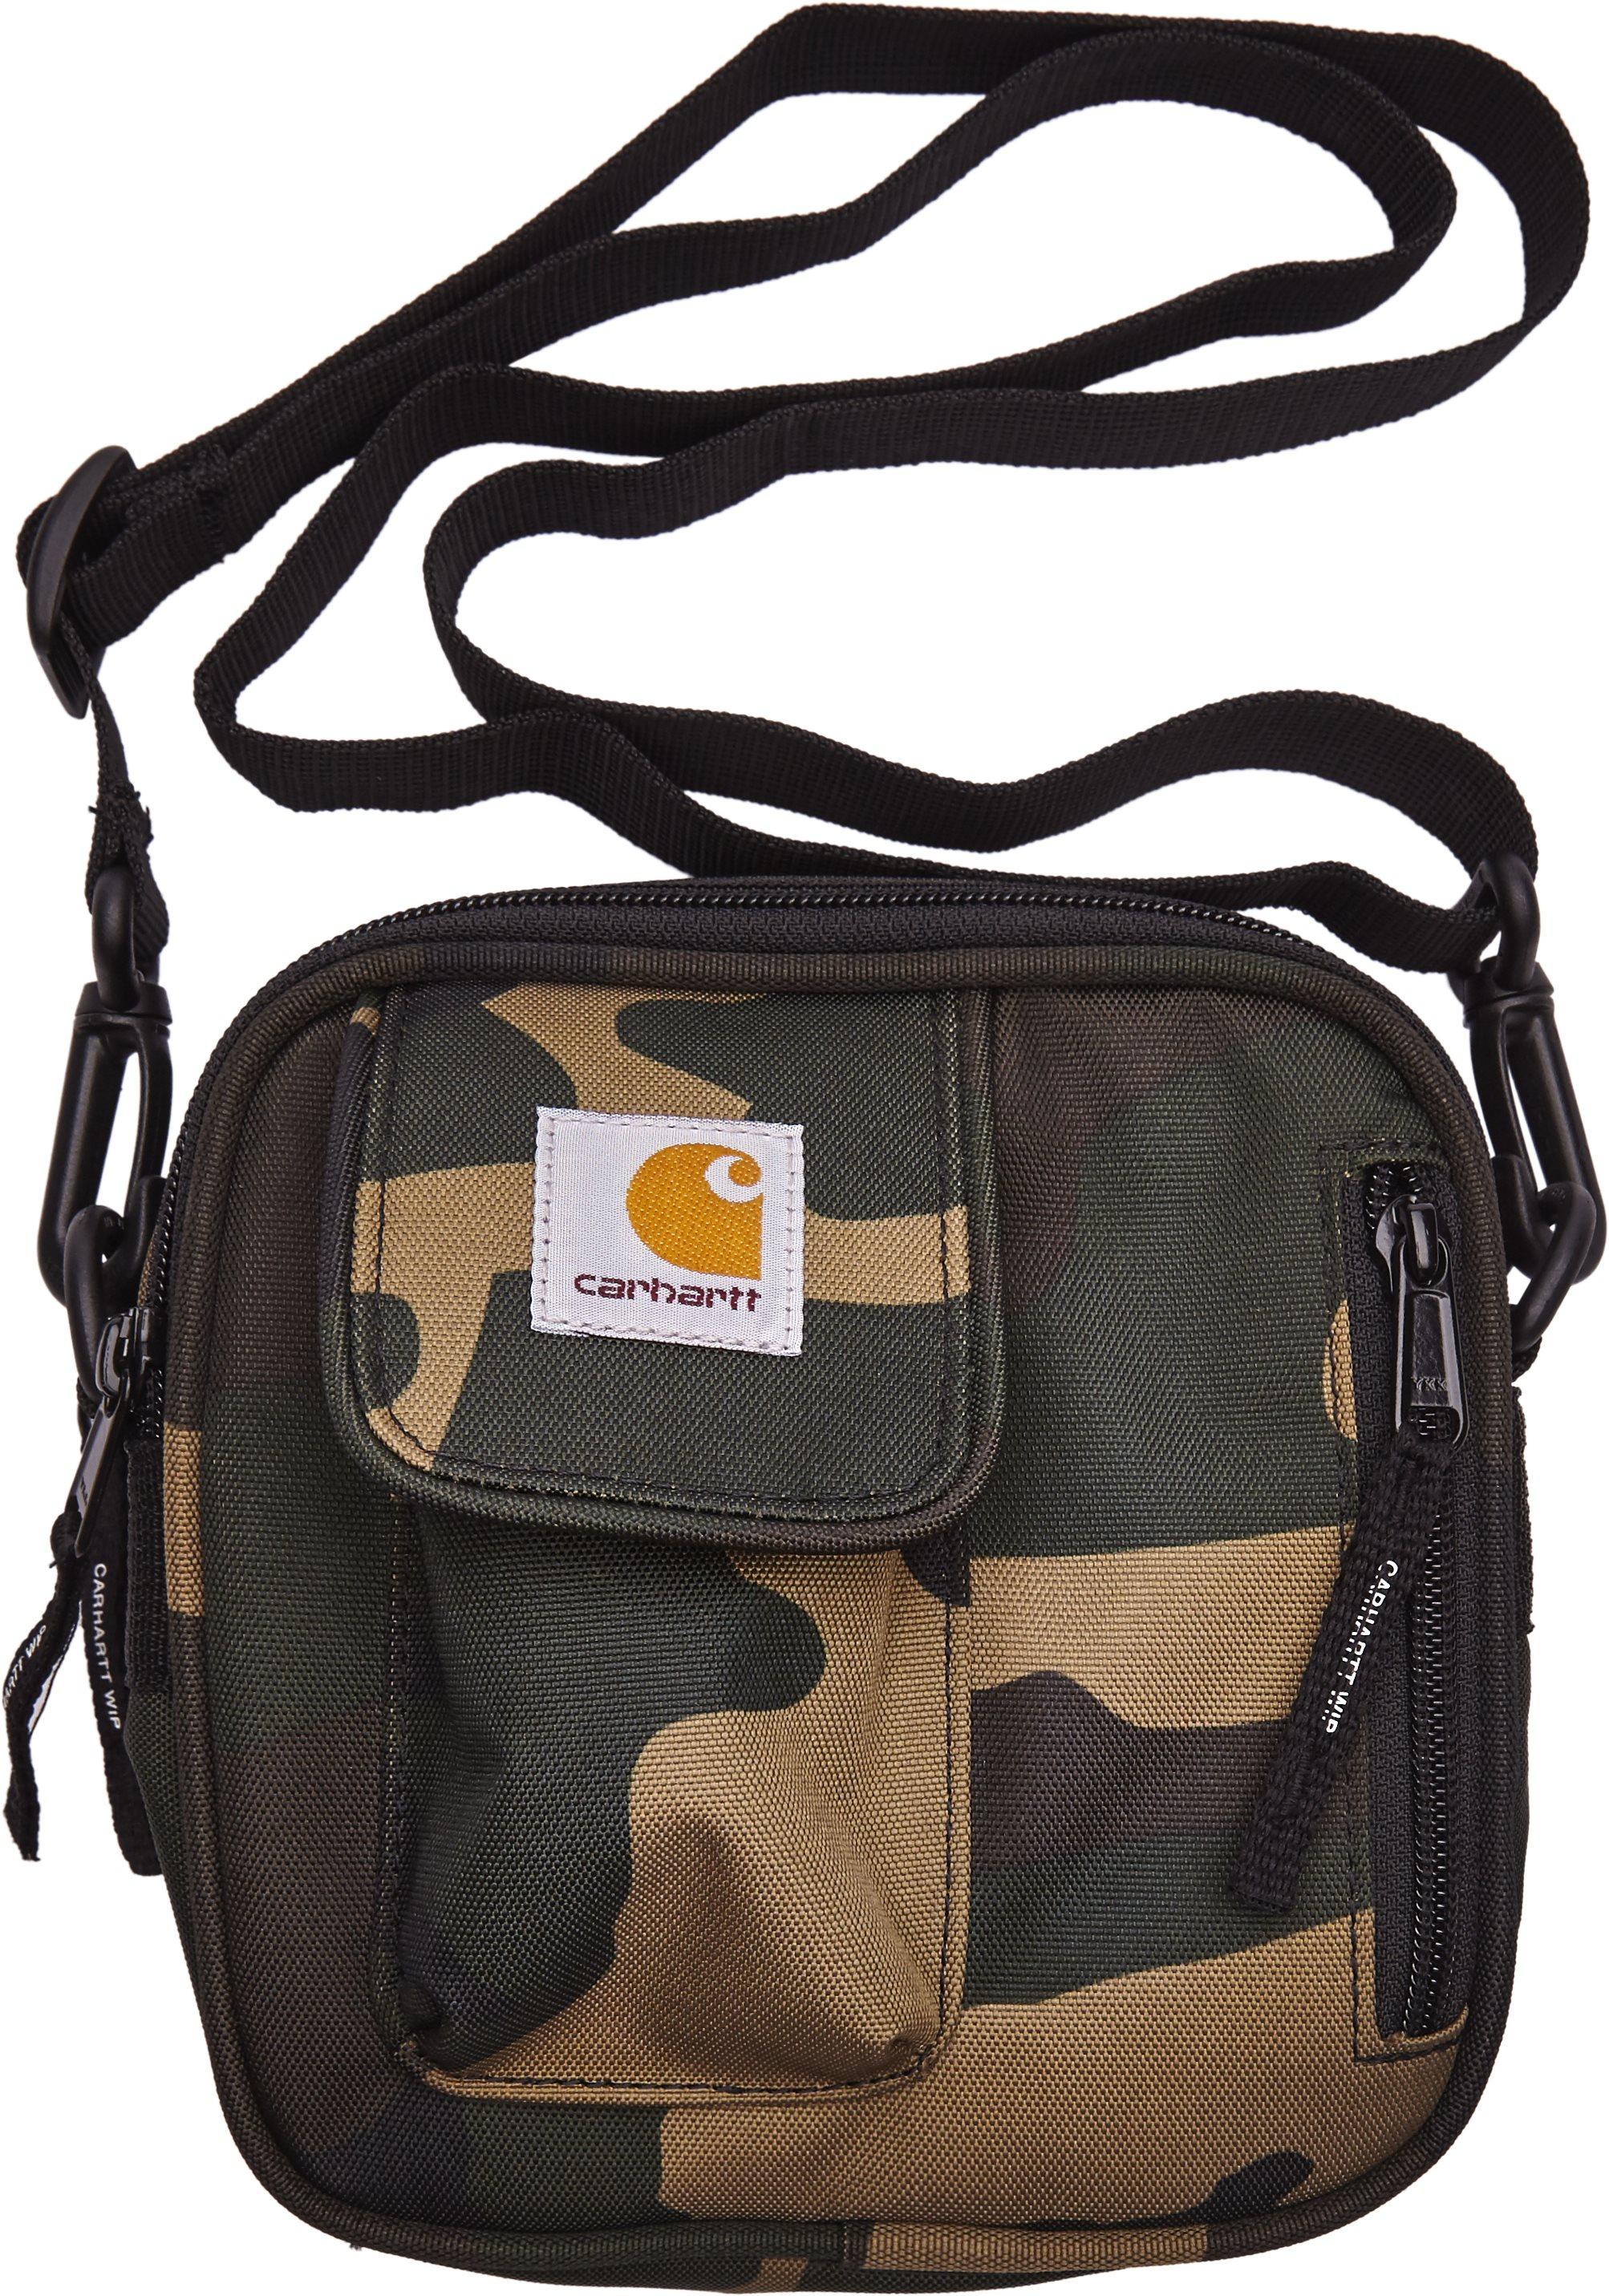 Essentials Small Bag - Tasker - Army